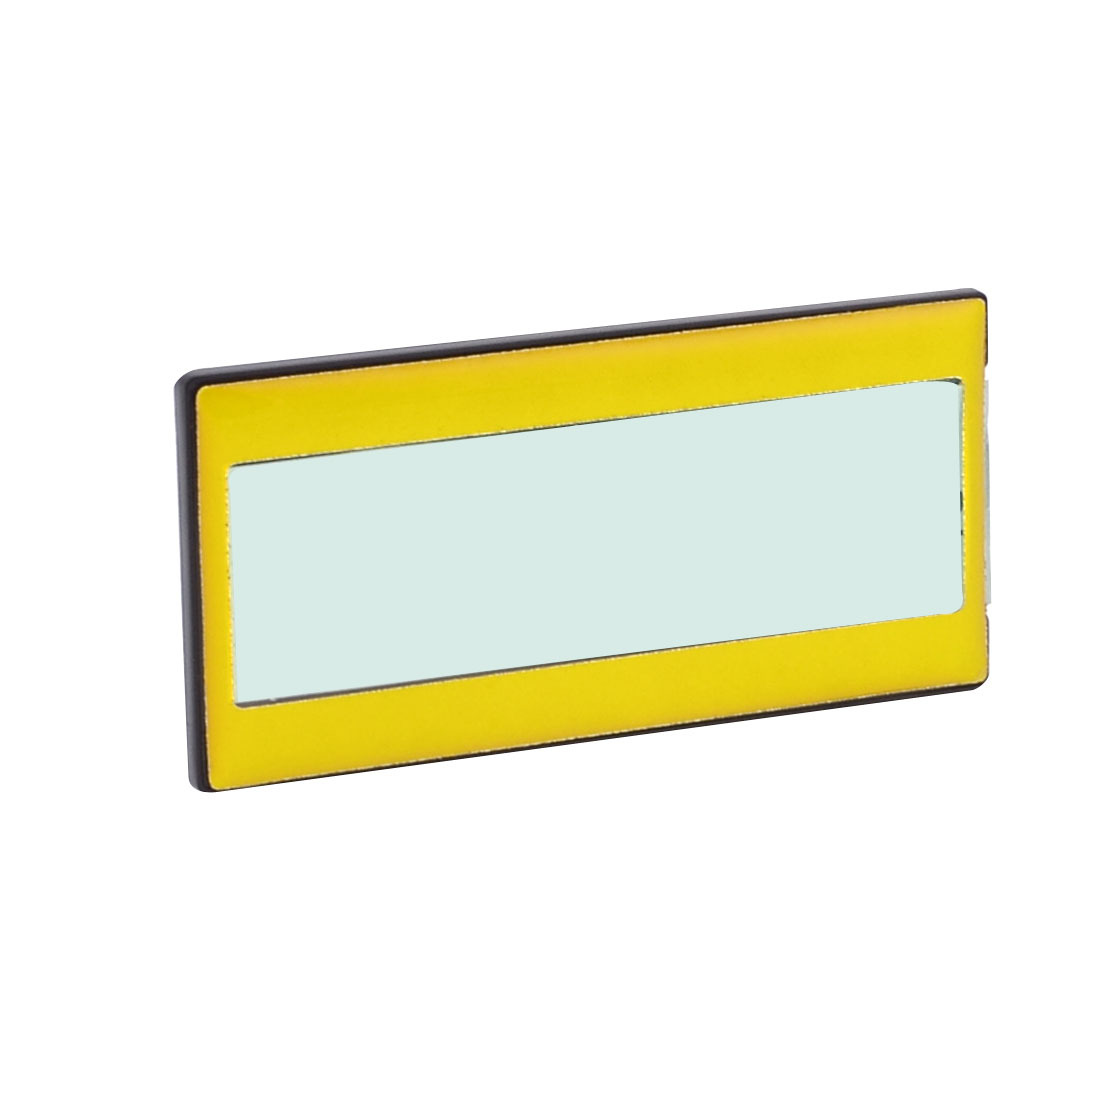 "Yellow Fit Badge Size 2.6"" x 0.75"" Black Housing School Badge Holder"